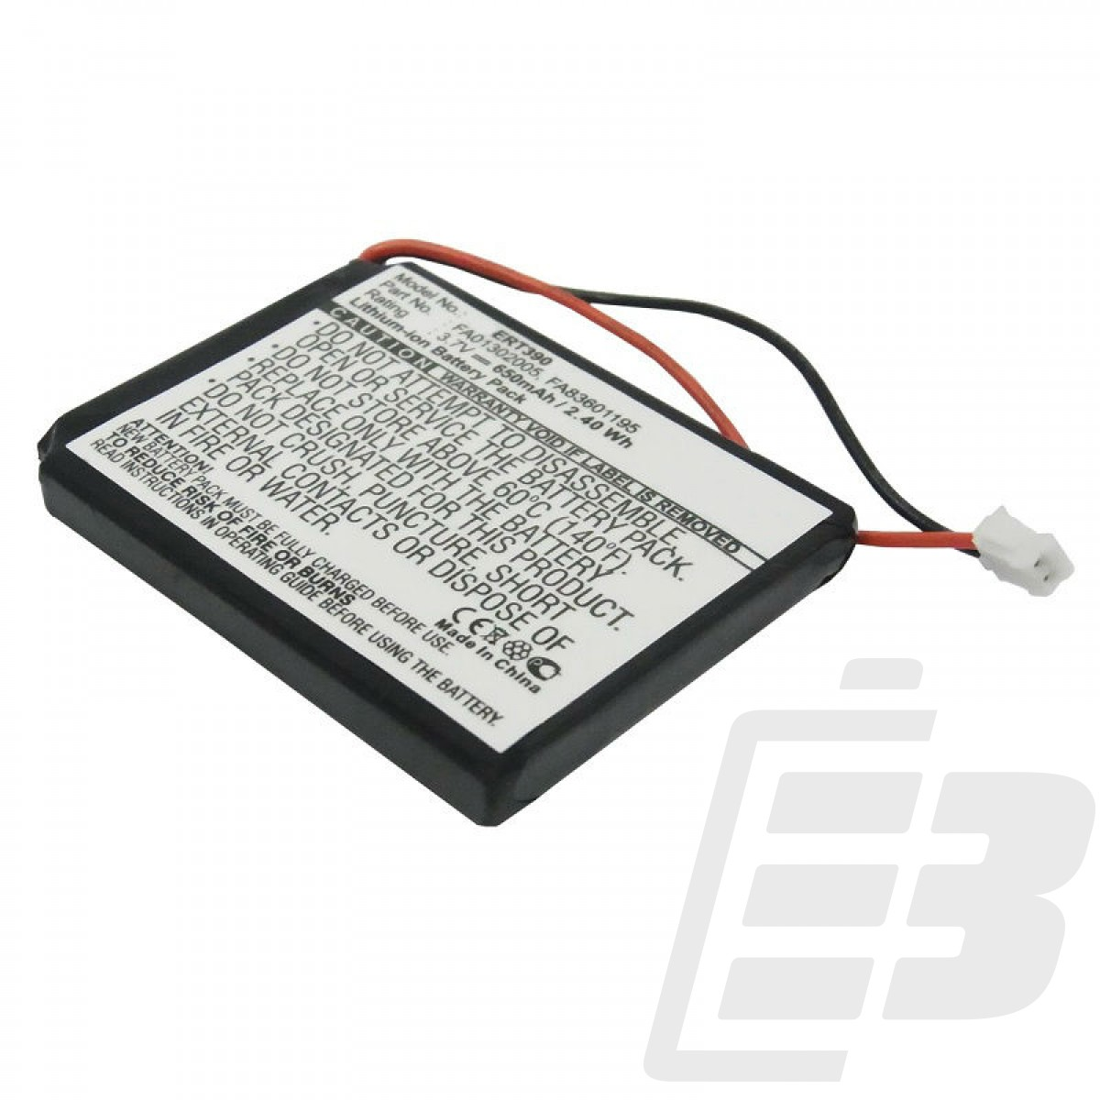 Cordless phone battery Ericsson DT390_1